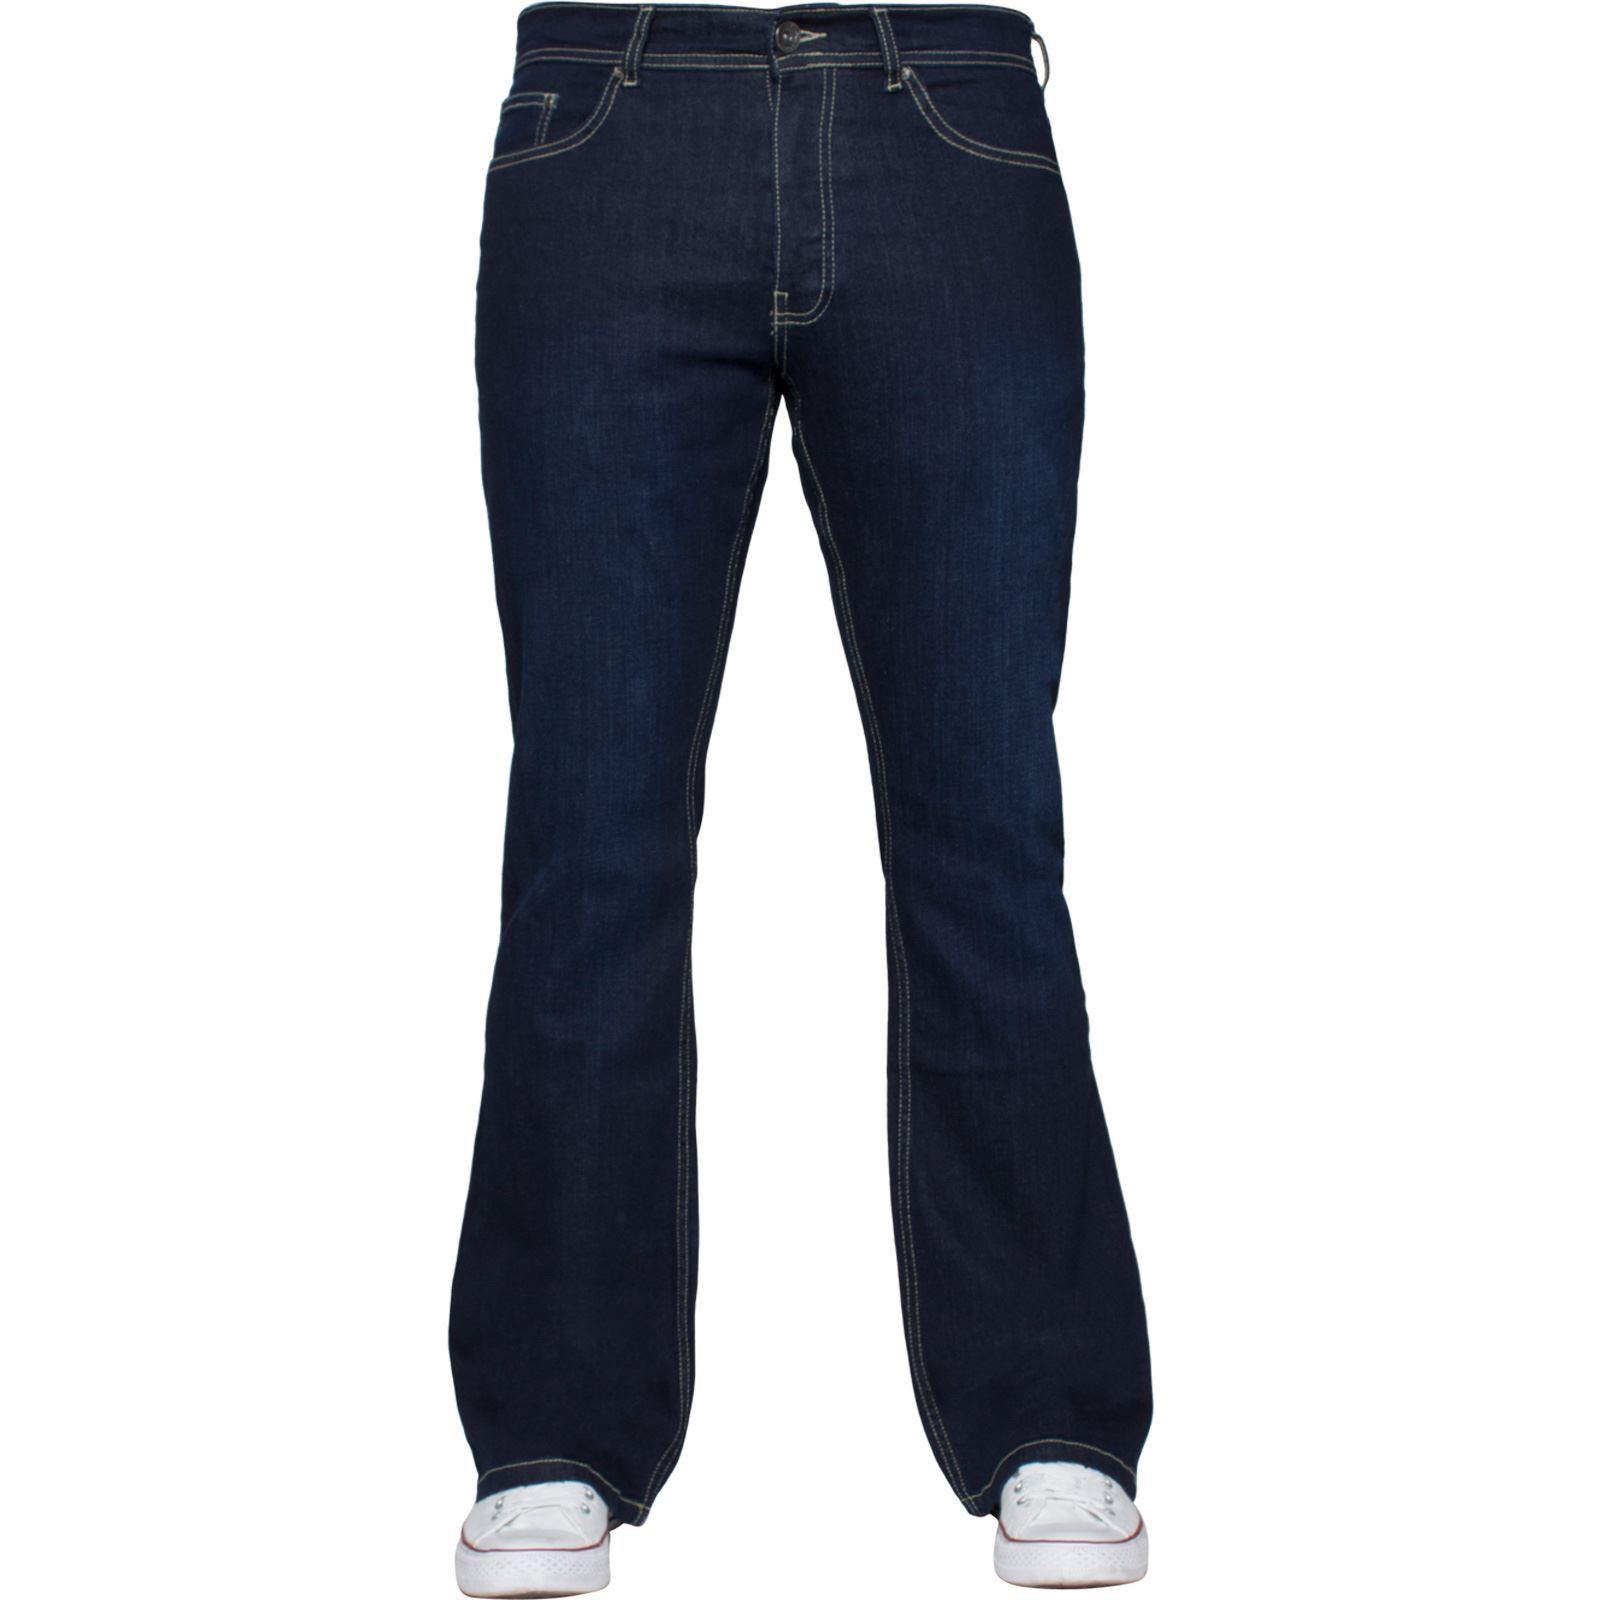 Para-Hombre-Pierna-Recta-Bootcut-Stretch-Denim-Regulares-Pantalon-de-trabajo-Kruze-Todas-Cinturas miniatura 95